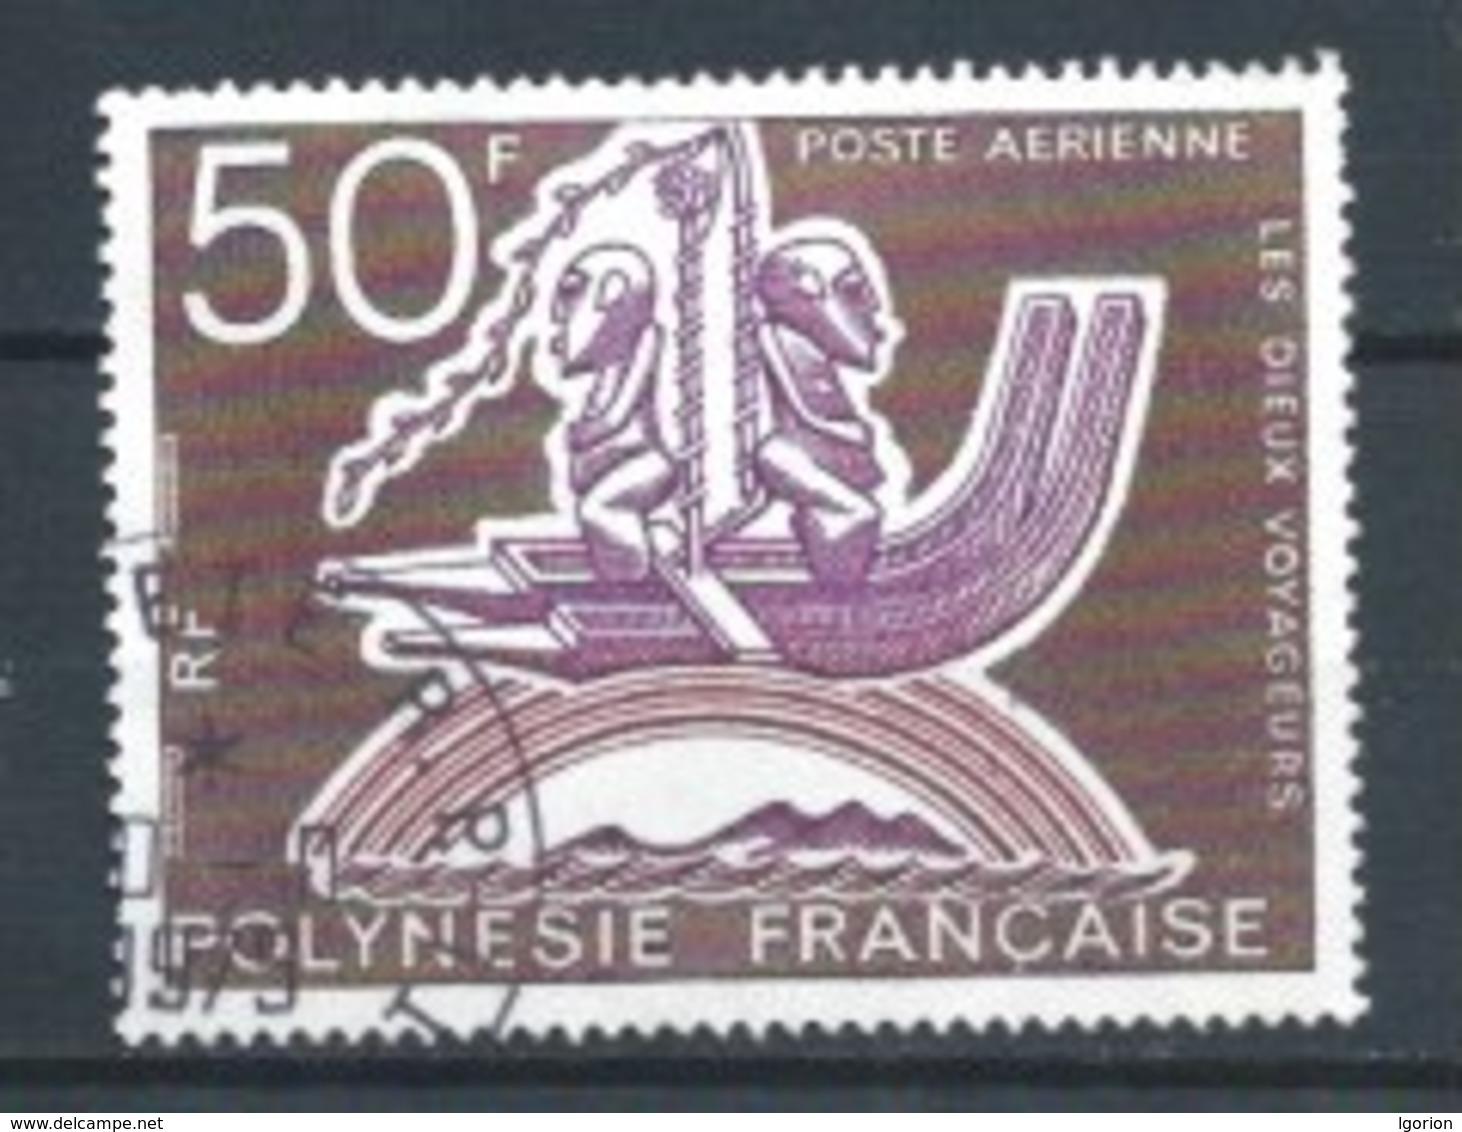 Polinesia Francesa 1975 (O) USADOS MI-192 YT-PA89 LES DIEUX VOYAGEURS  (CACHET ROND) - Gebruikt